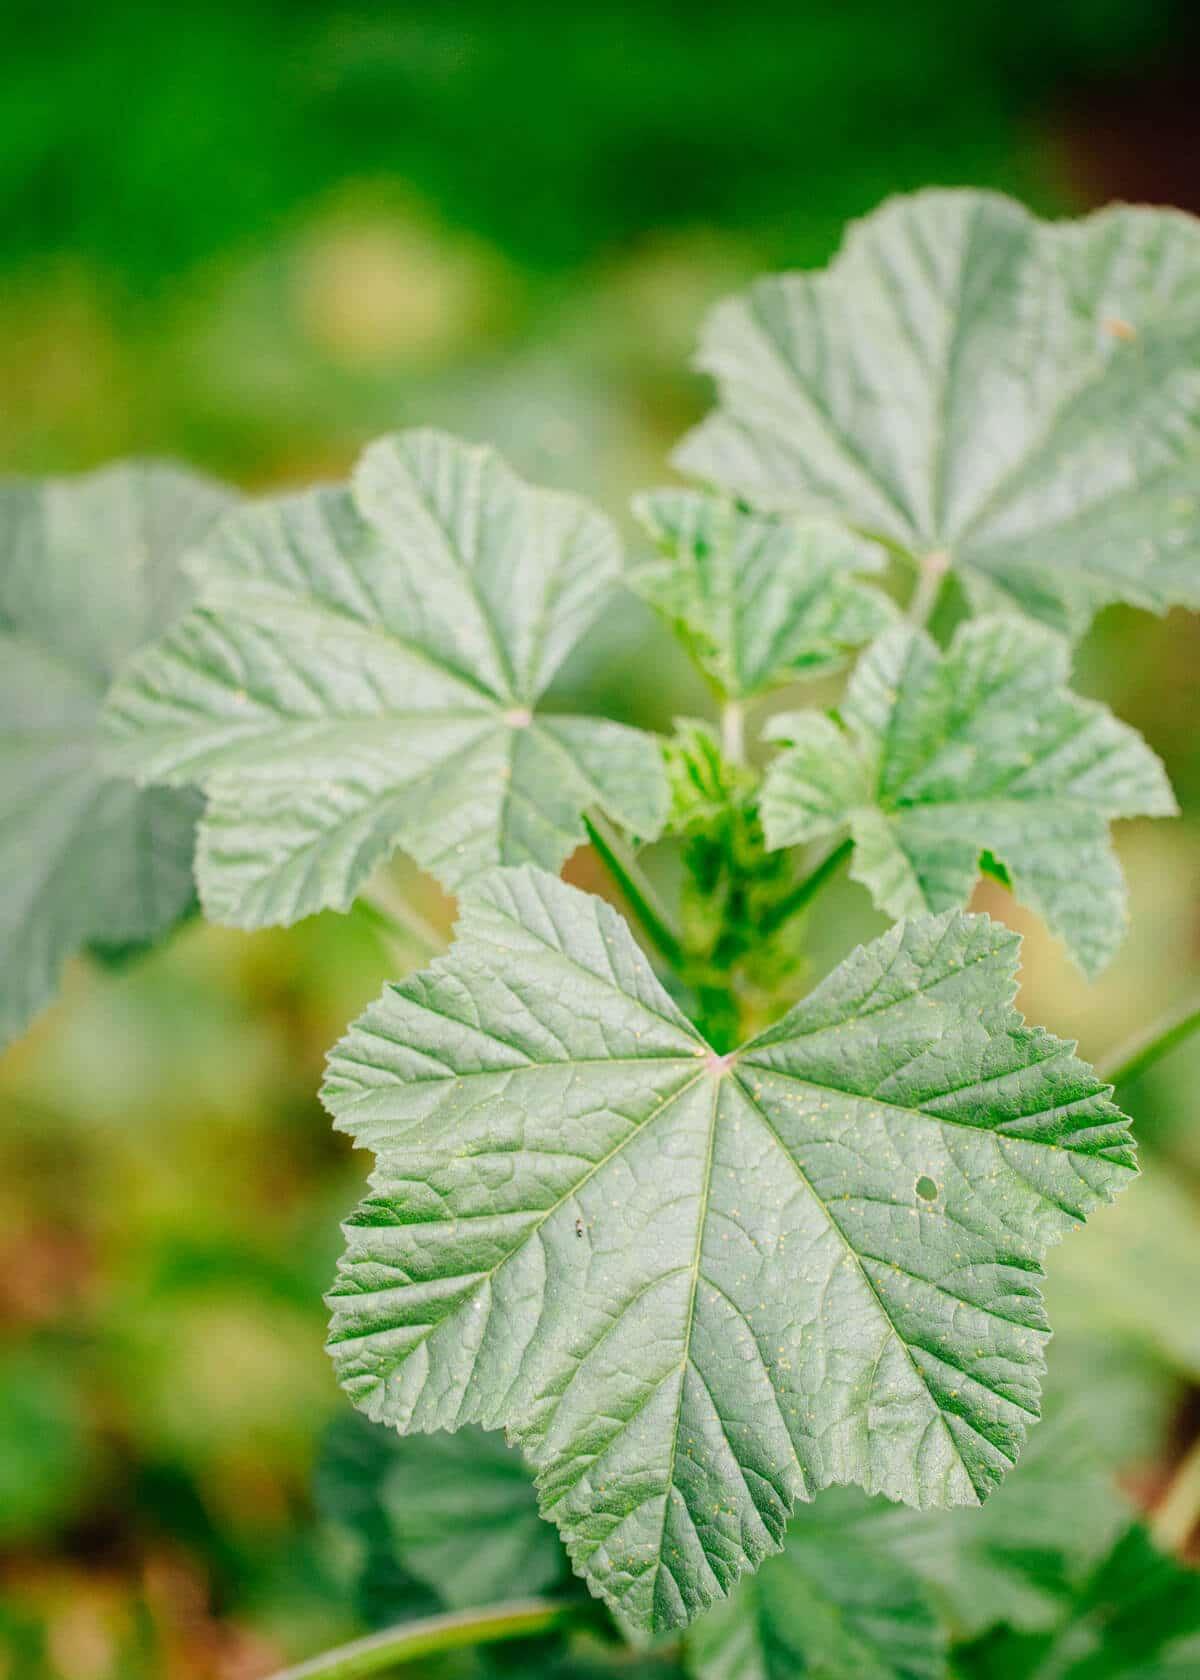 Cheeseweed has geranium-like leaves